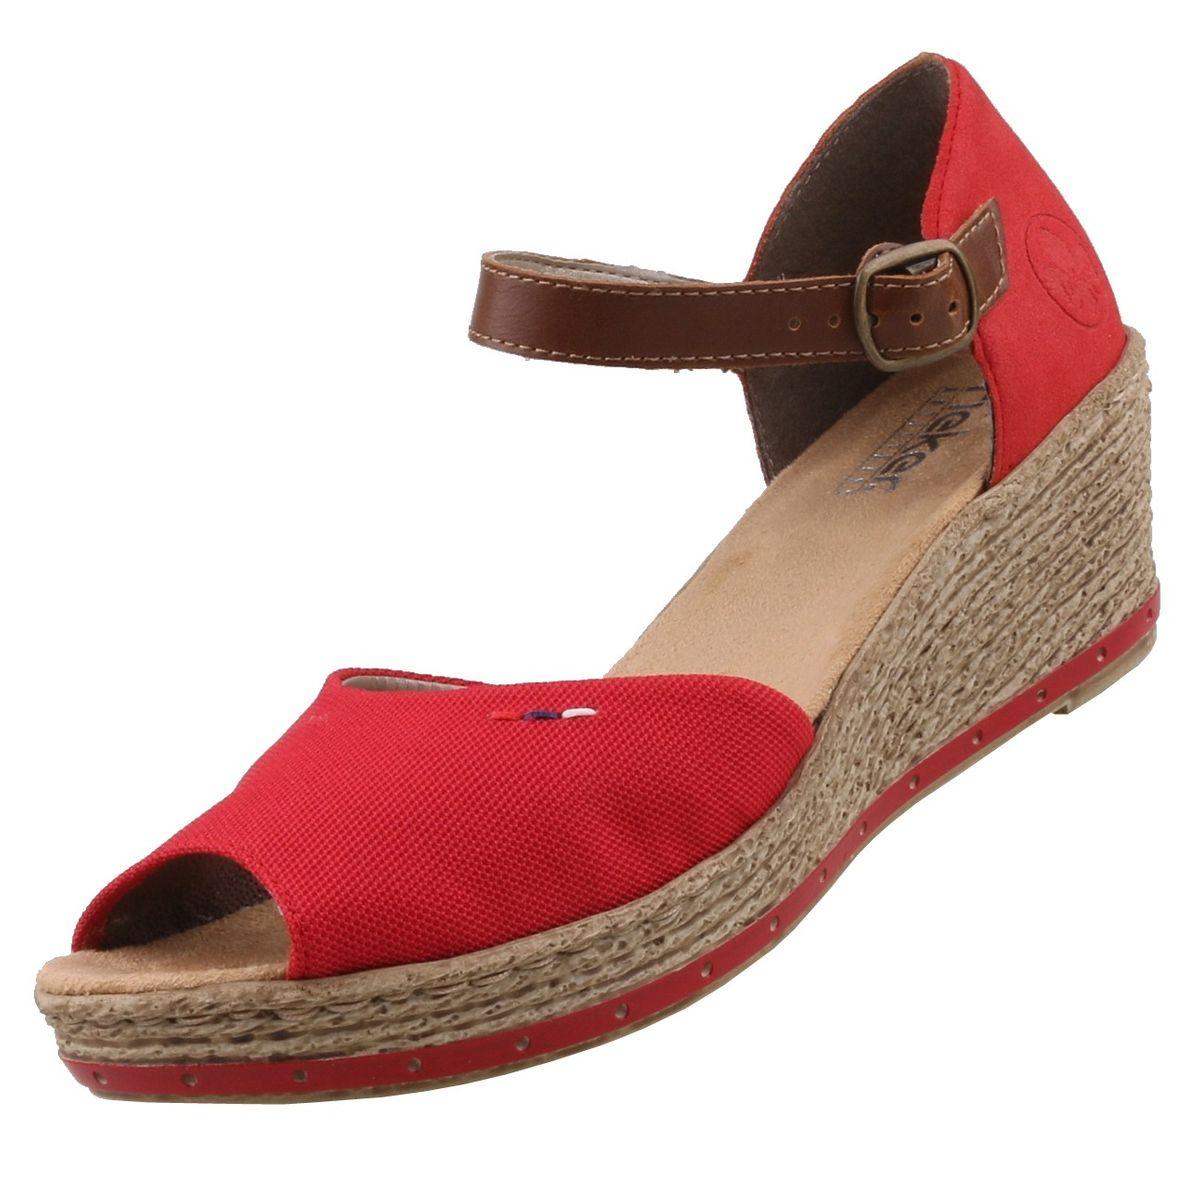 Rieker Damen Sandalen Rot | Trendbereich